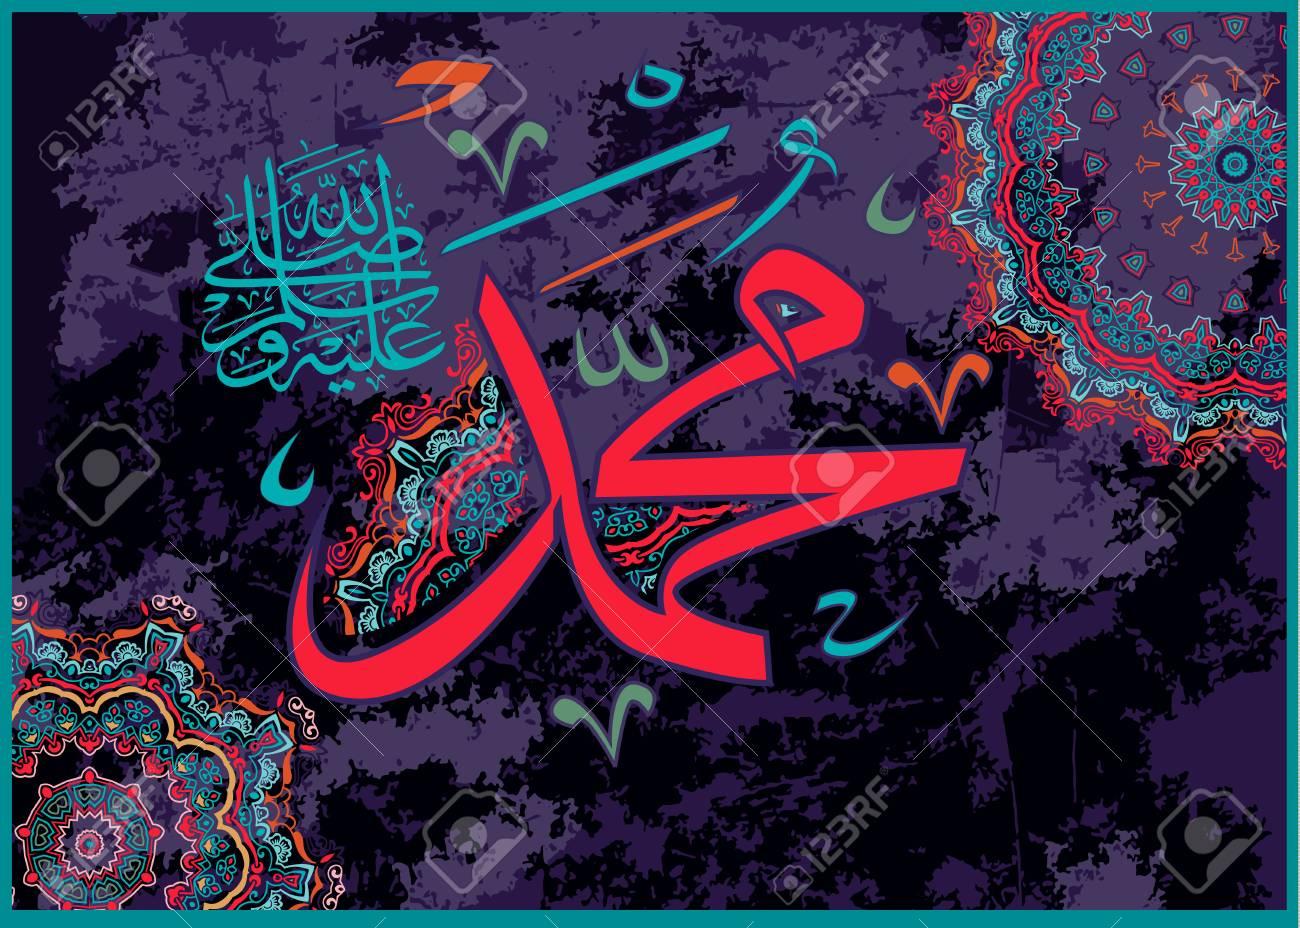 Islamic calligraphy Muhammad, sallallaahu alaihi WA sallam, can